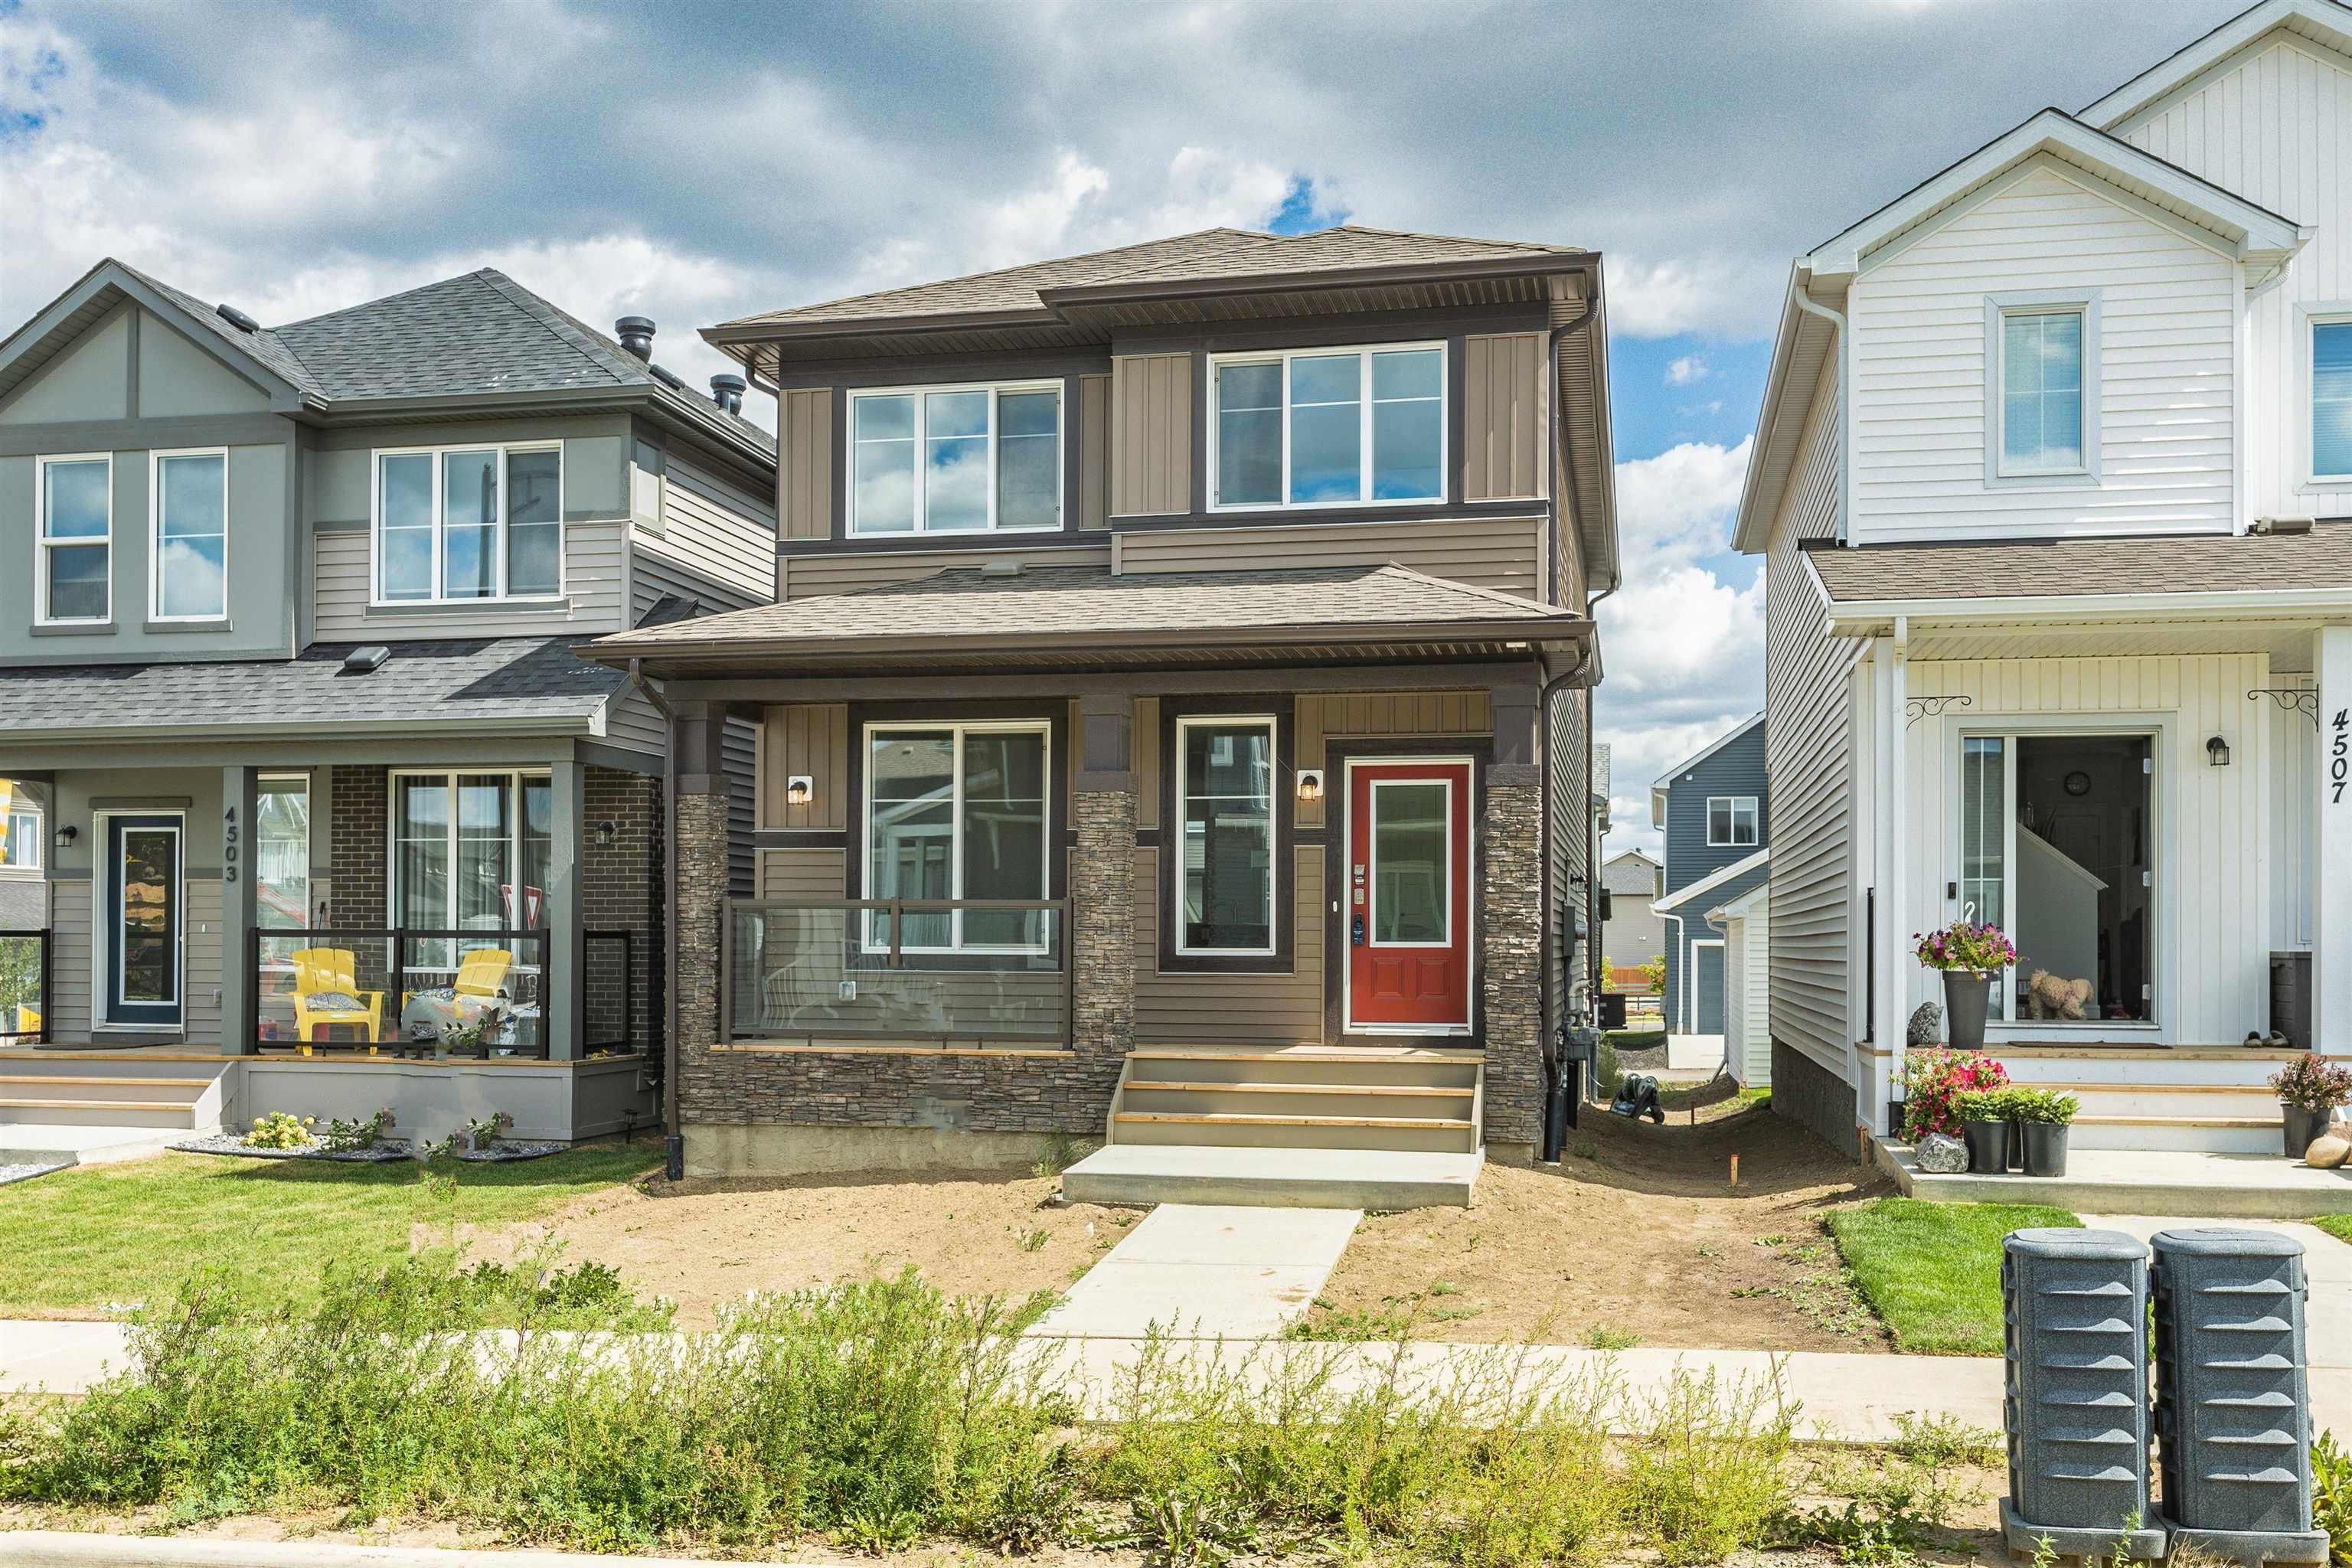 Main Photo: 4505 KINSELLA Link in Edmonton: Zone 56 House for sale : MLS®# E4257926